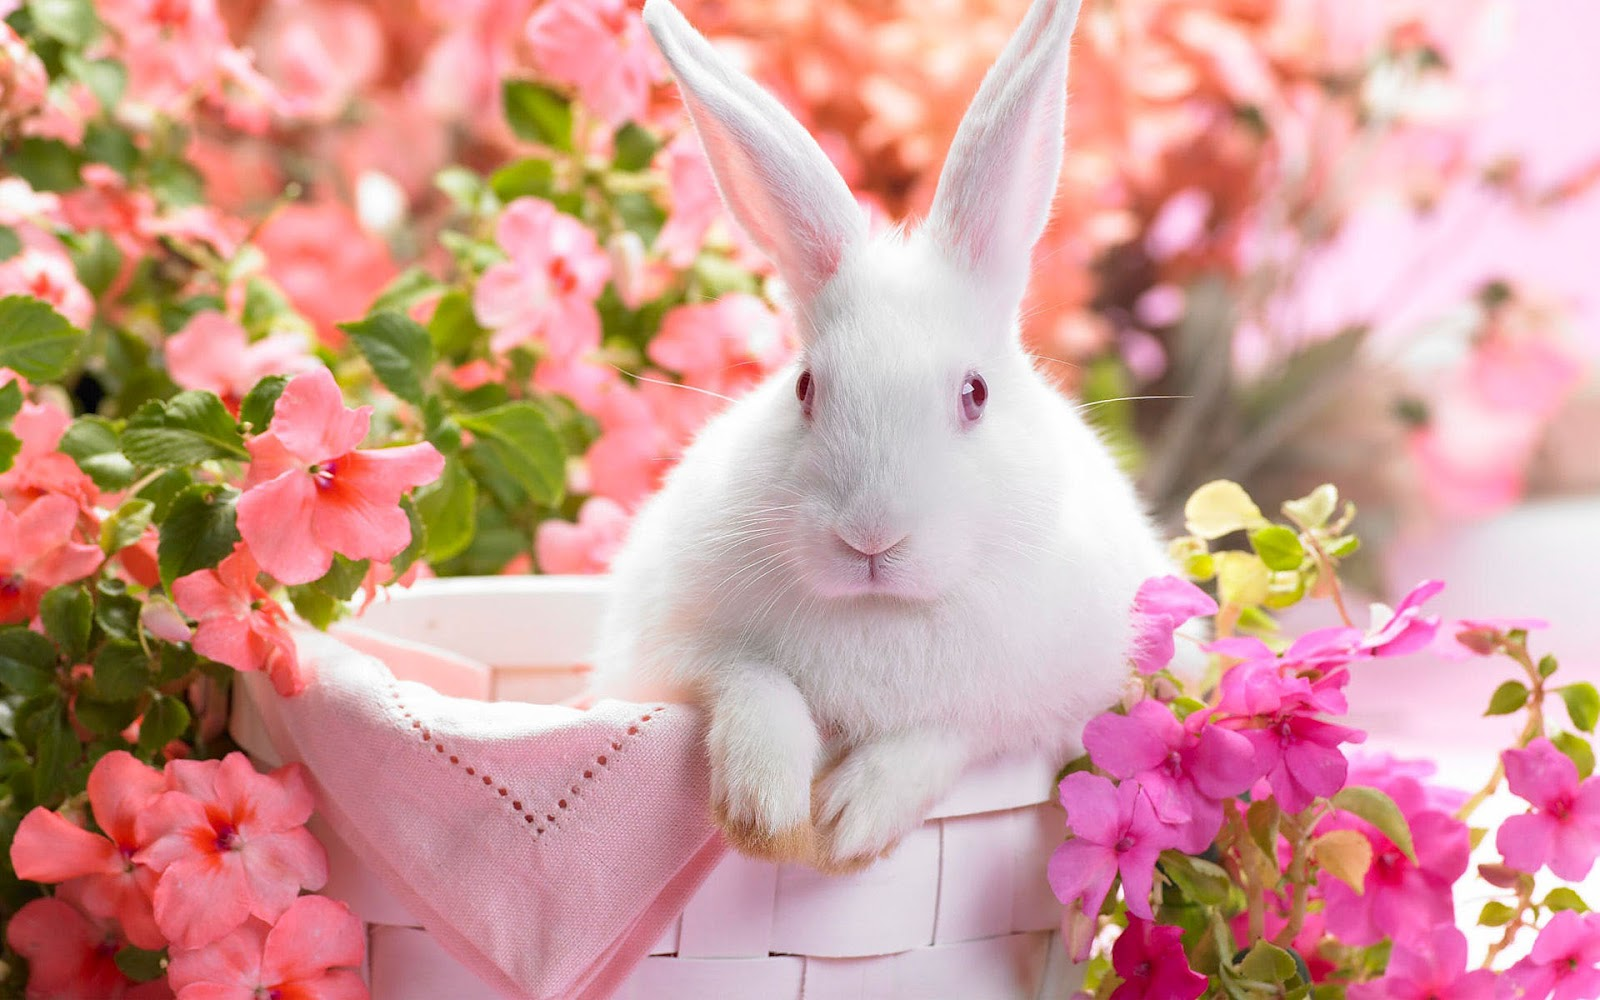 http://1.bp.blogspot.com/-JtLMcRYLk2I/T3bKUXHDJuI/AAAAAAAADlc/-M02-lreJYo/s1600/hd-easter-bunny-wallpaper.jpg